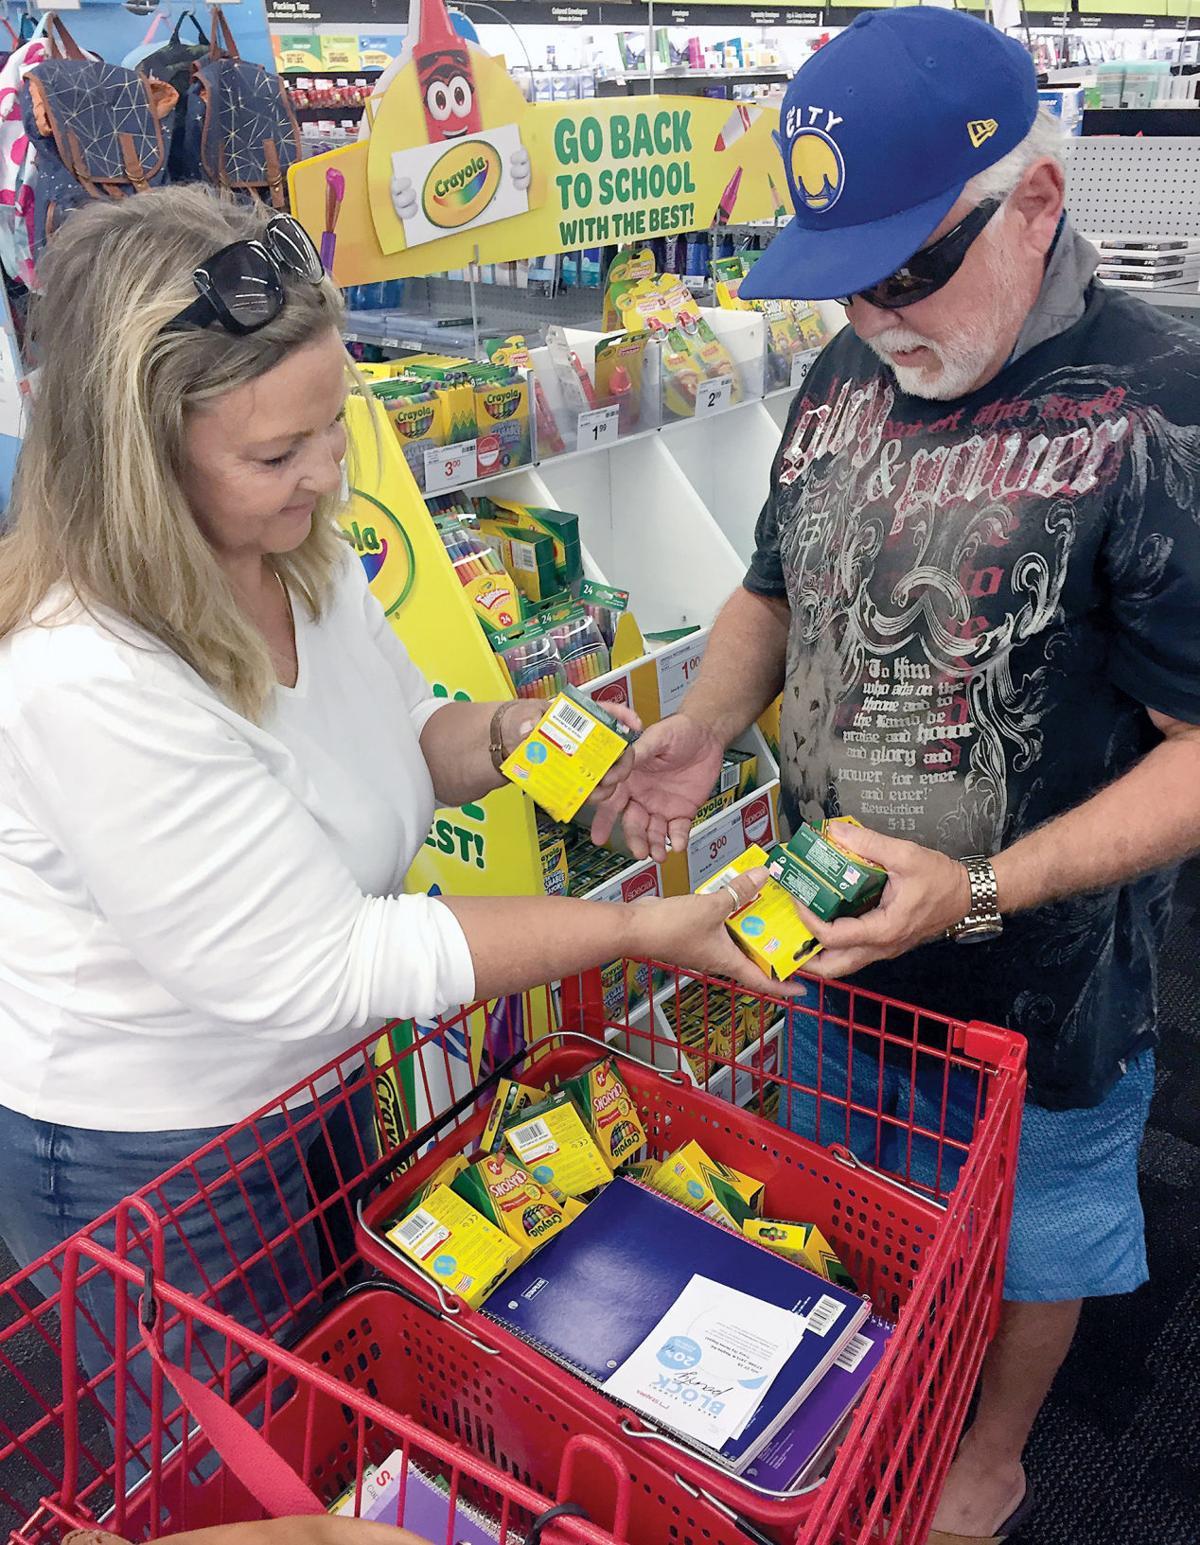 Teachers stock up on supplies